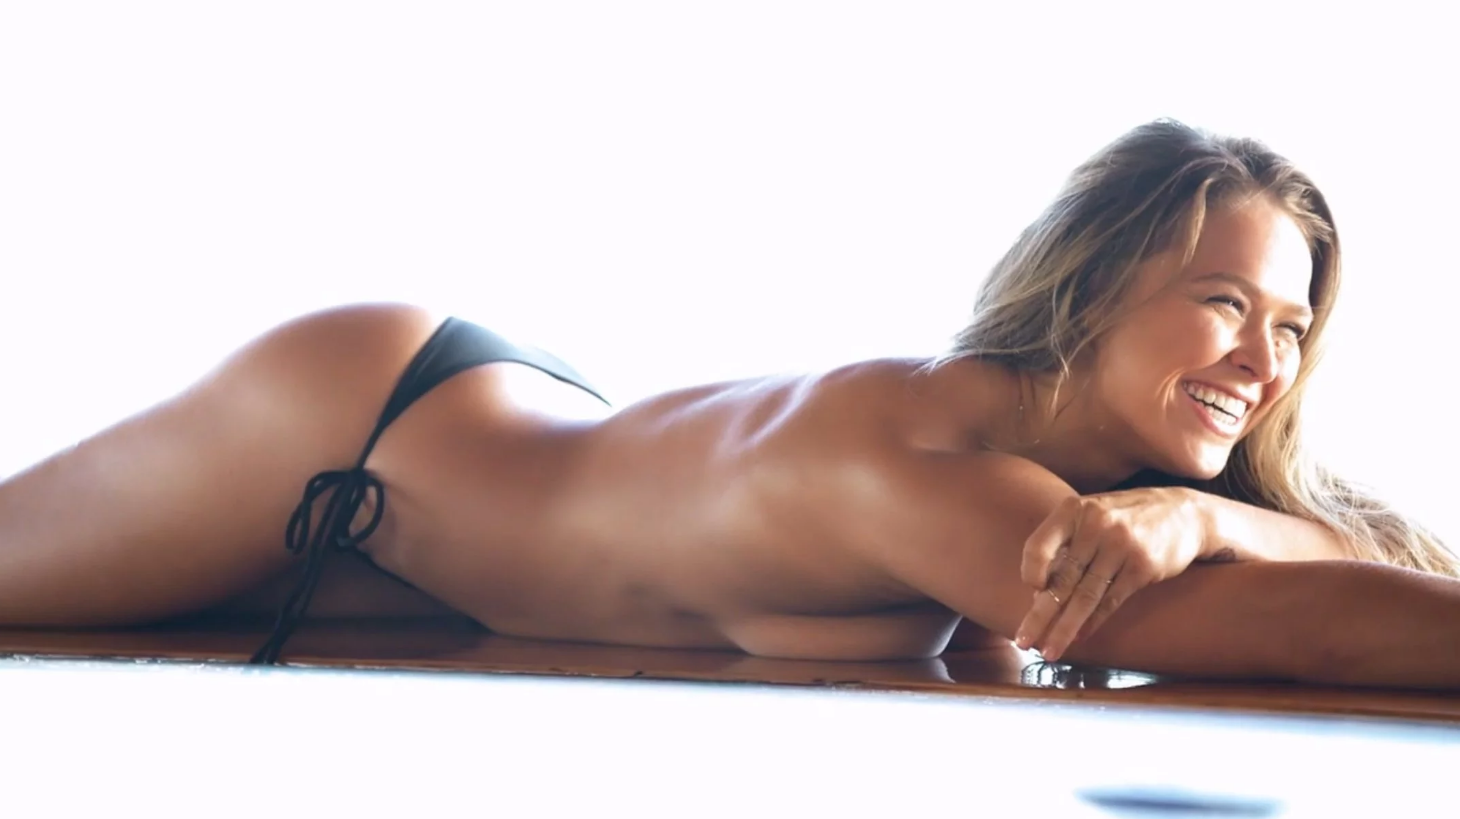 Ronda Rousey desnuda